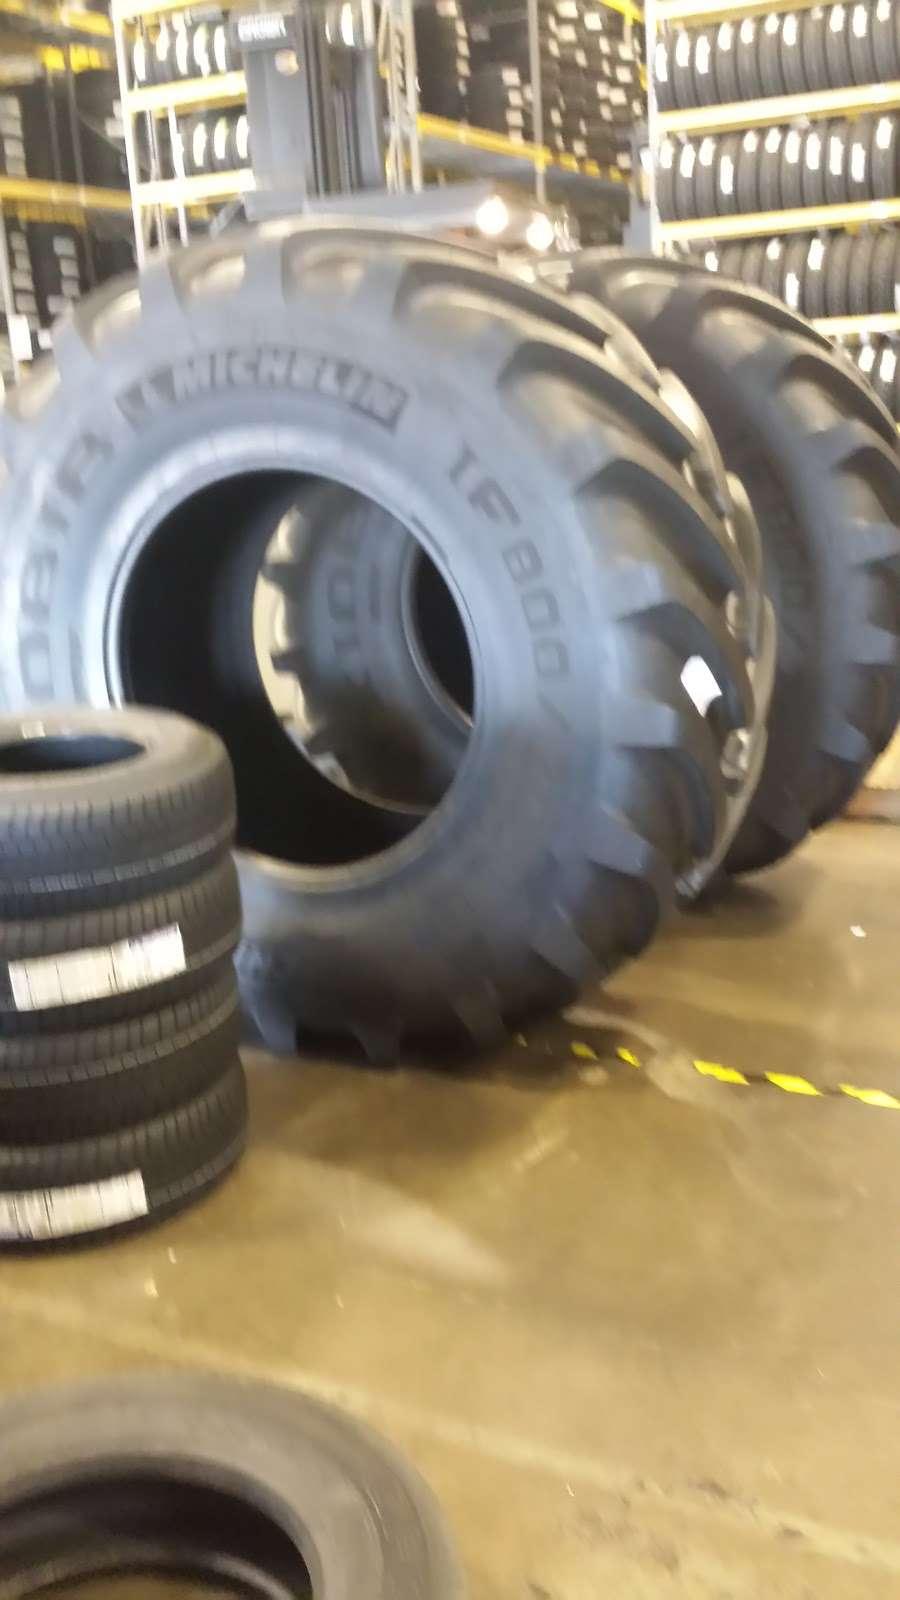 NTW - National Tire Wholesale - car repair  | Photo 4 of 4 | Address: 745 Refuge Way, Grand Prairie, TX 75050, USA | Phone: (817) 652-1225